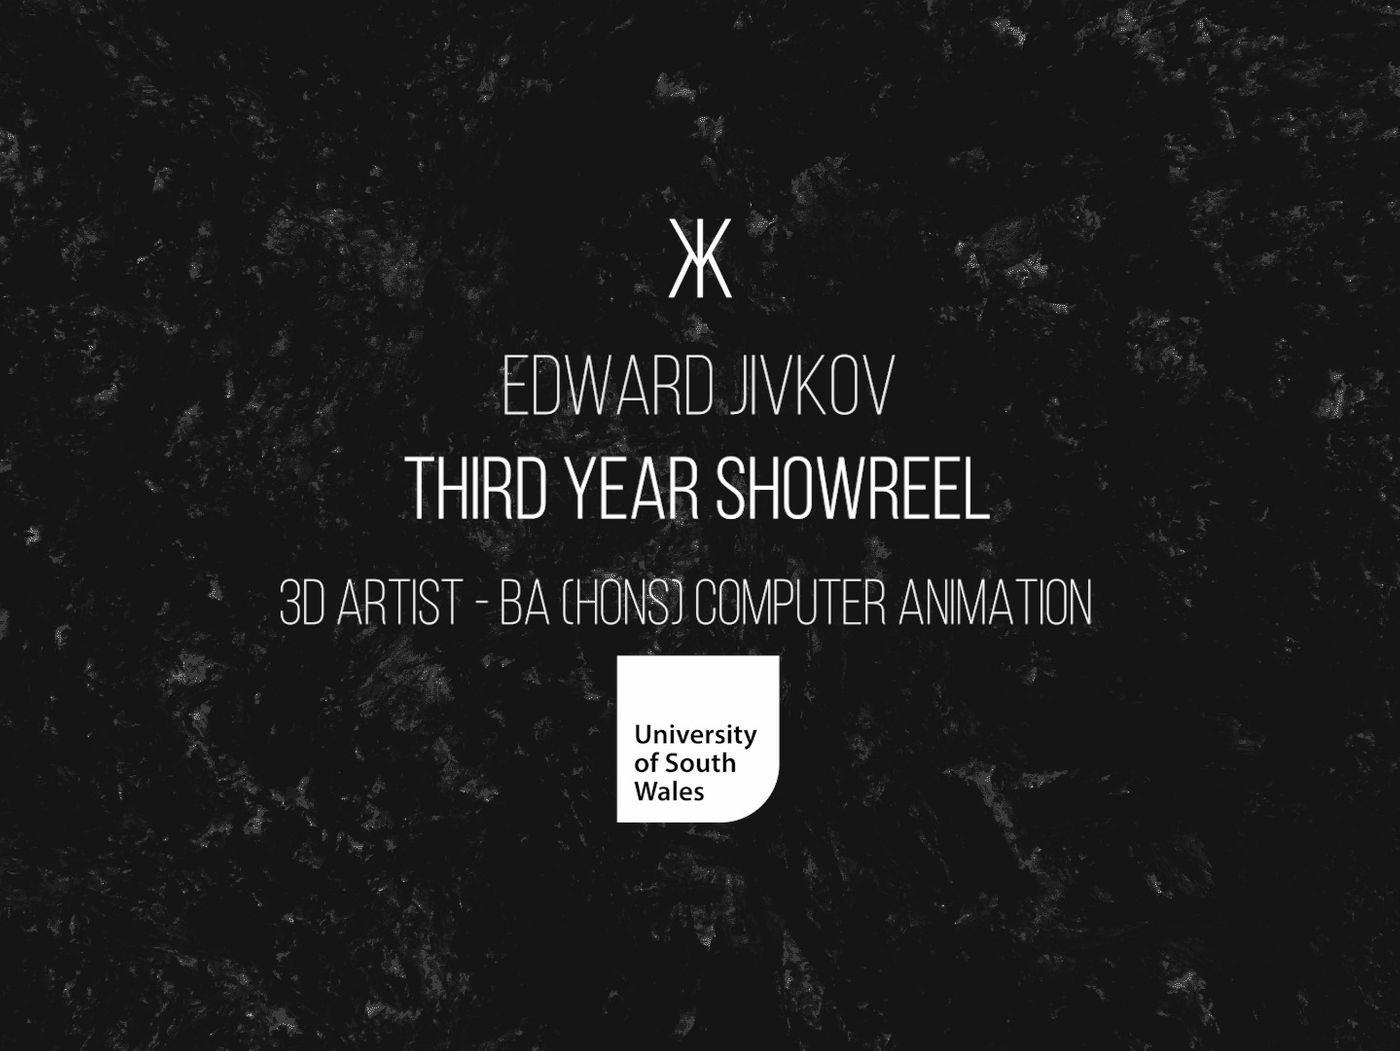 Edward Jivkov - Third Year Showreel